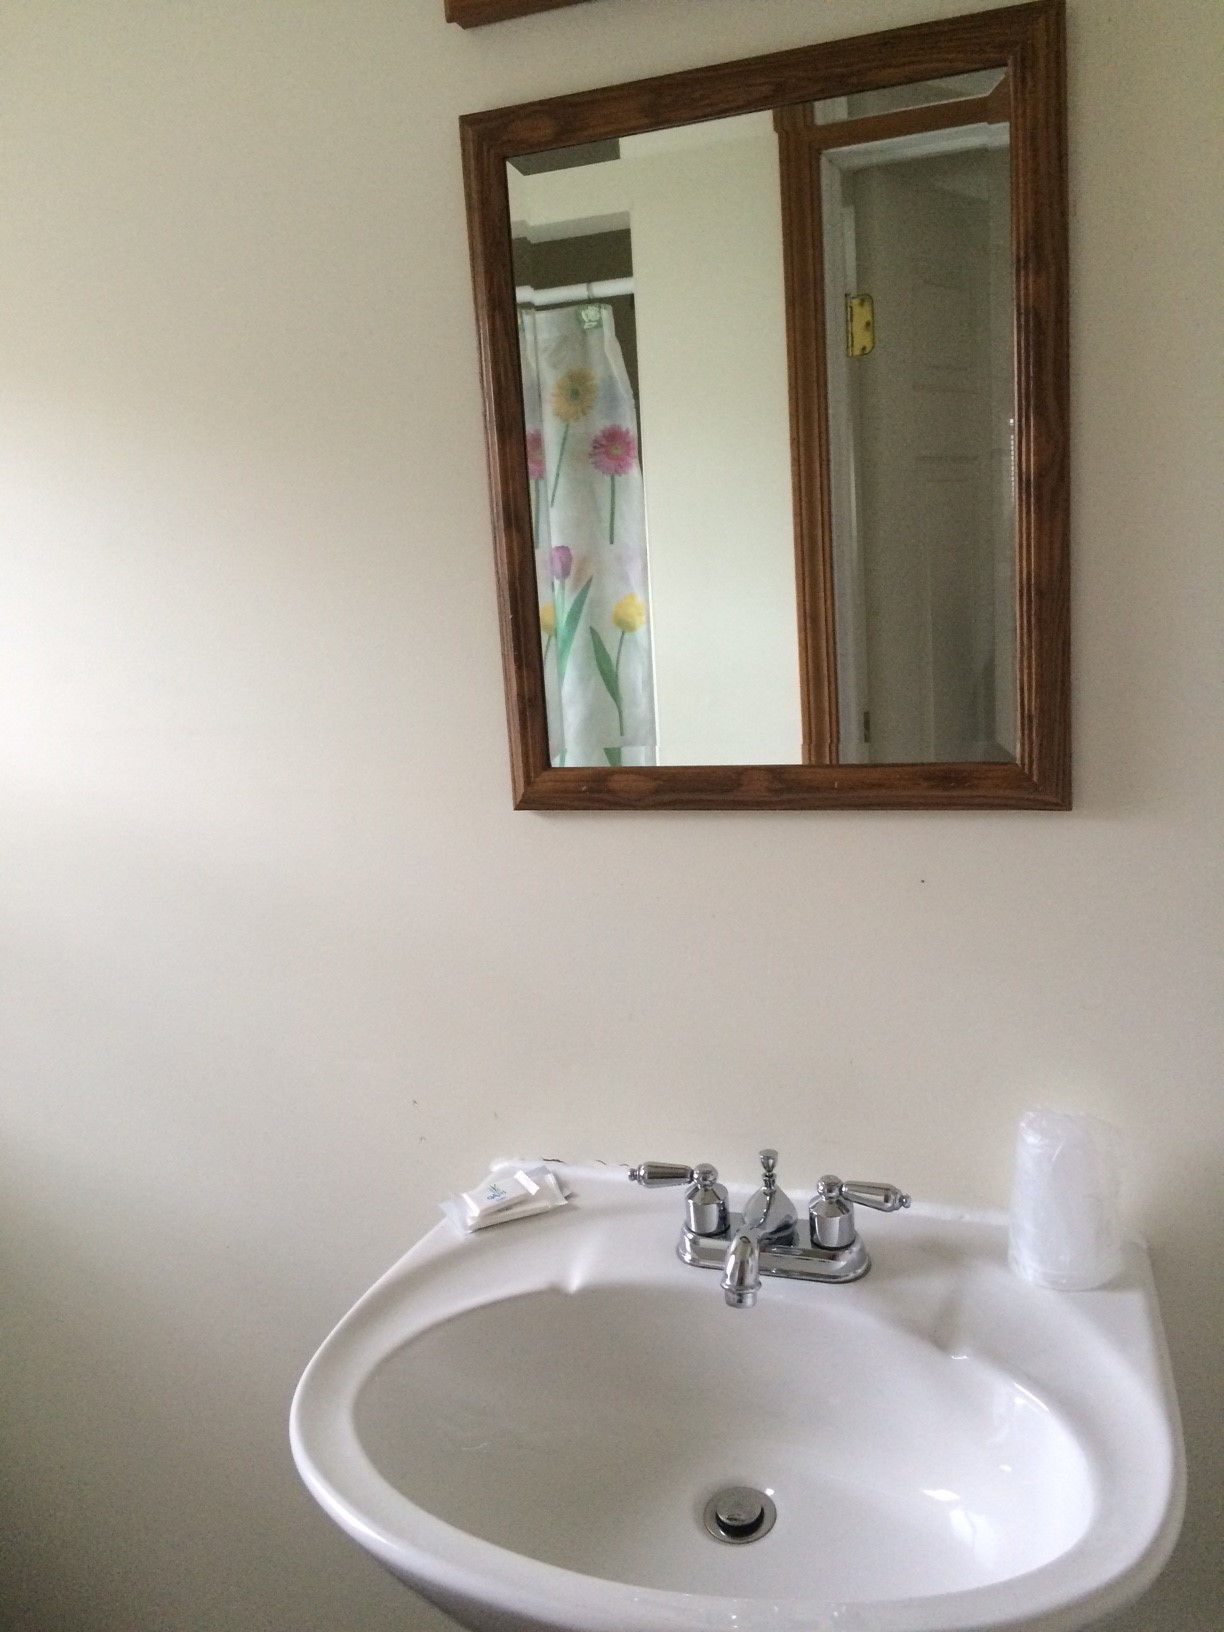 Blue Spruce Motel - Cabin Number 18 (1) - Interior Bathroom.jpg